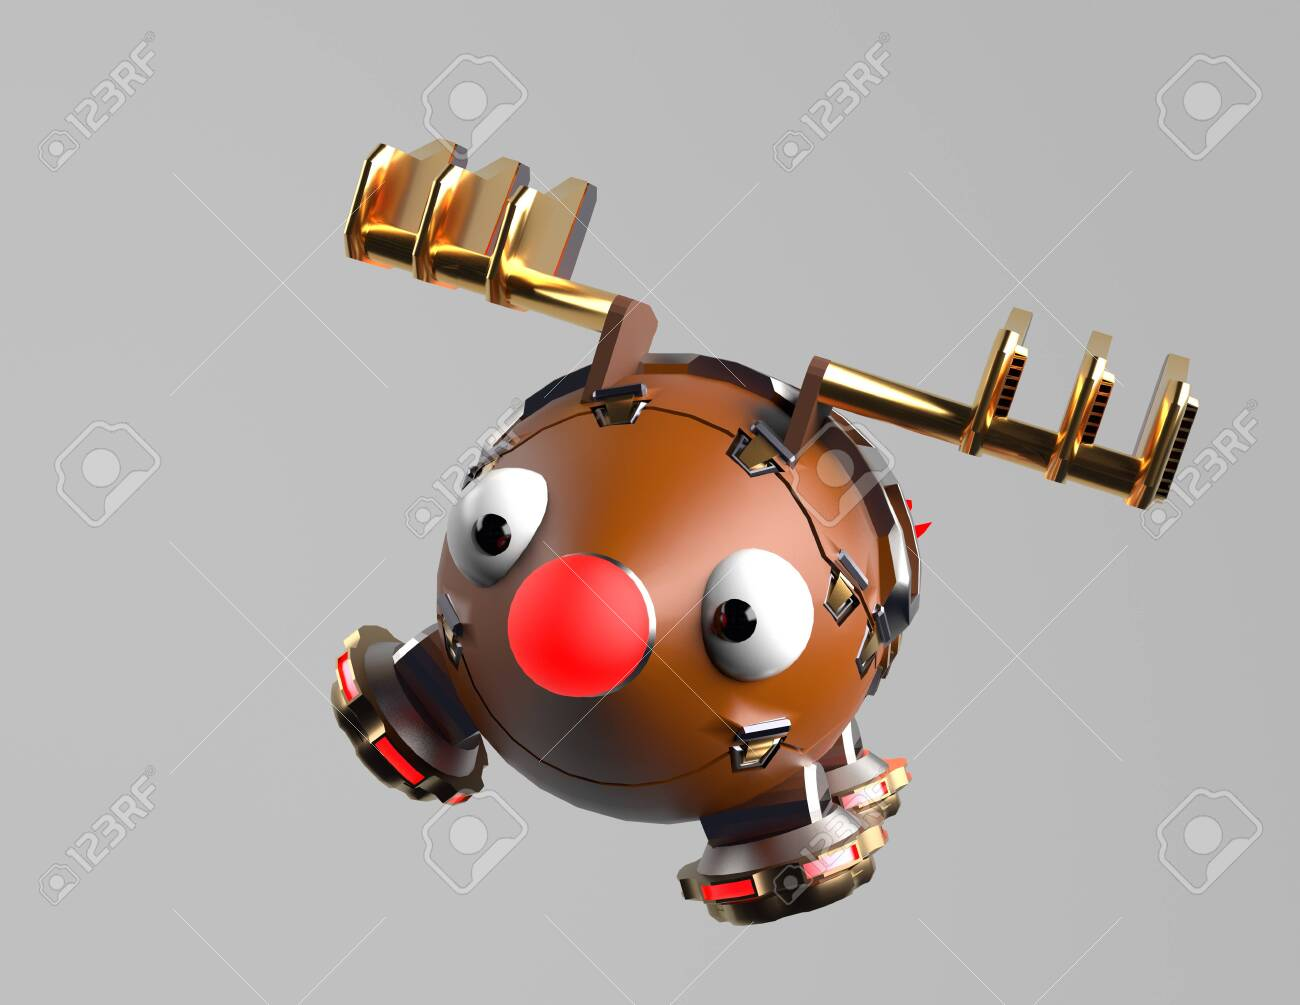 The robot deer,fly deer,christms deer,3d render. - 137047406